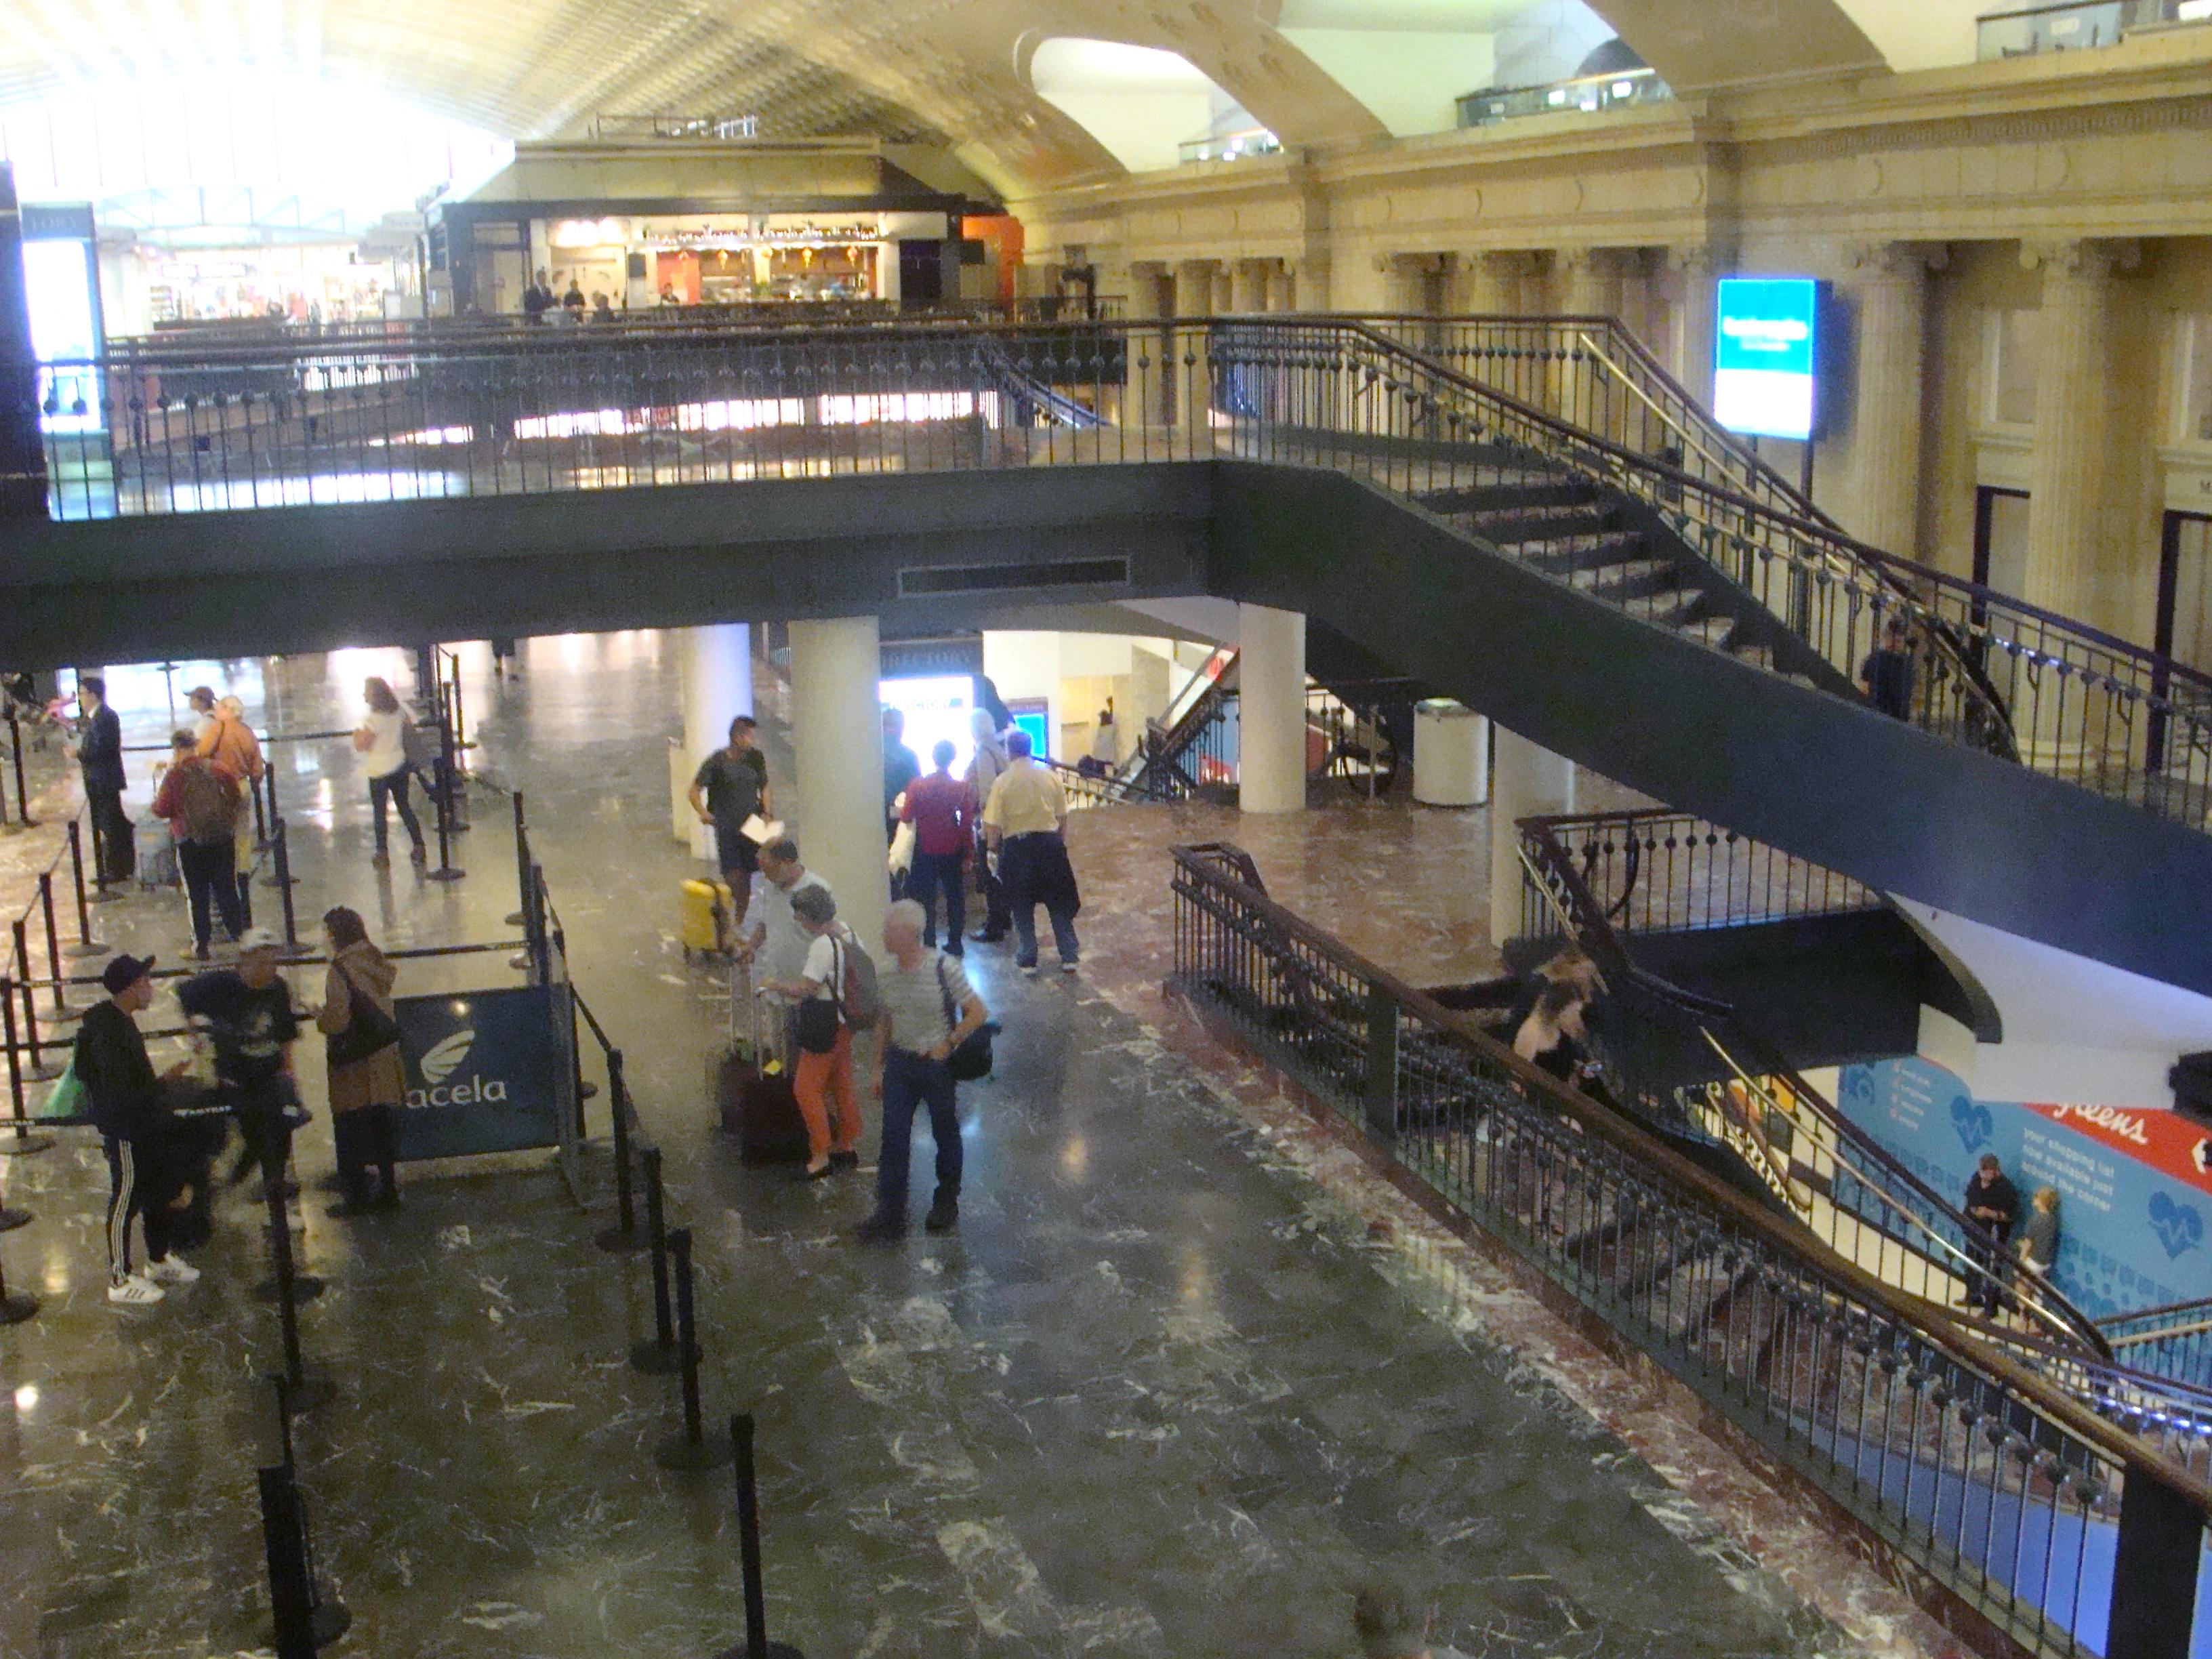 Washington Union Station - Gypsy & The Navigator